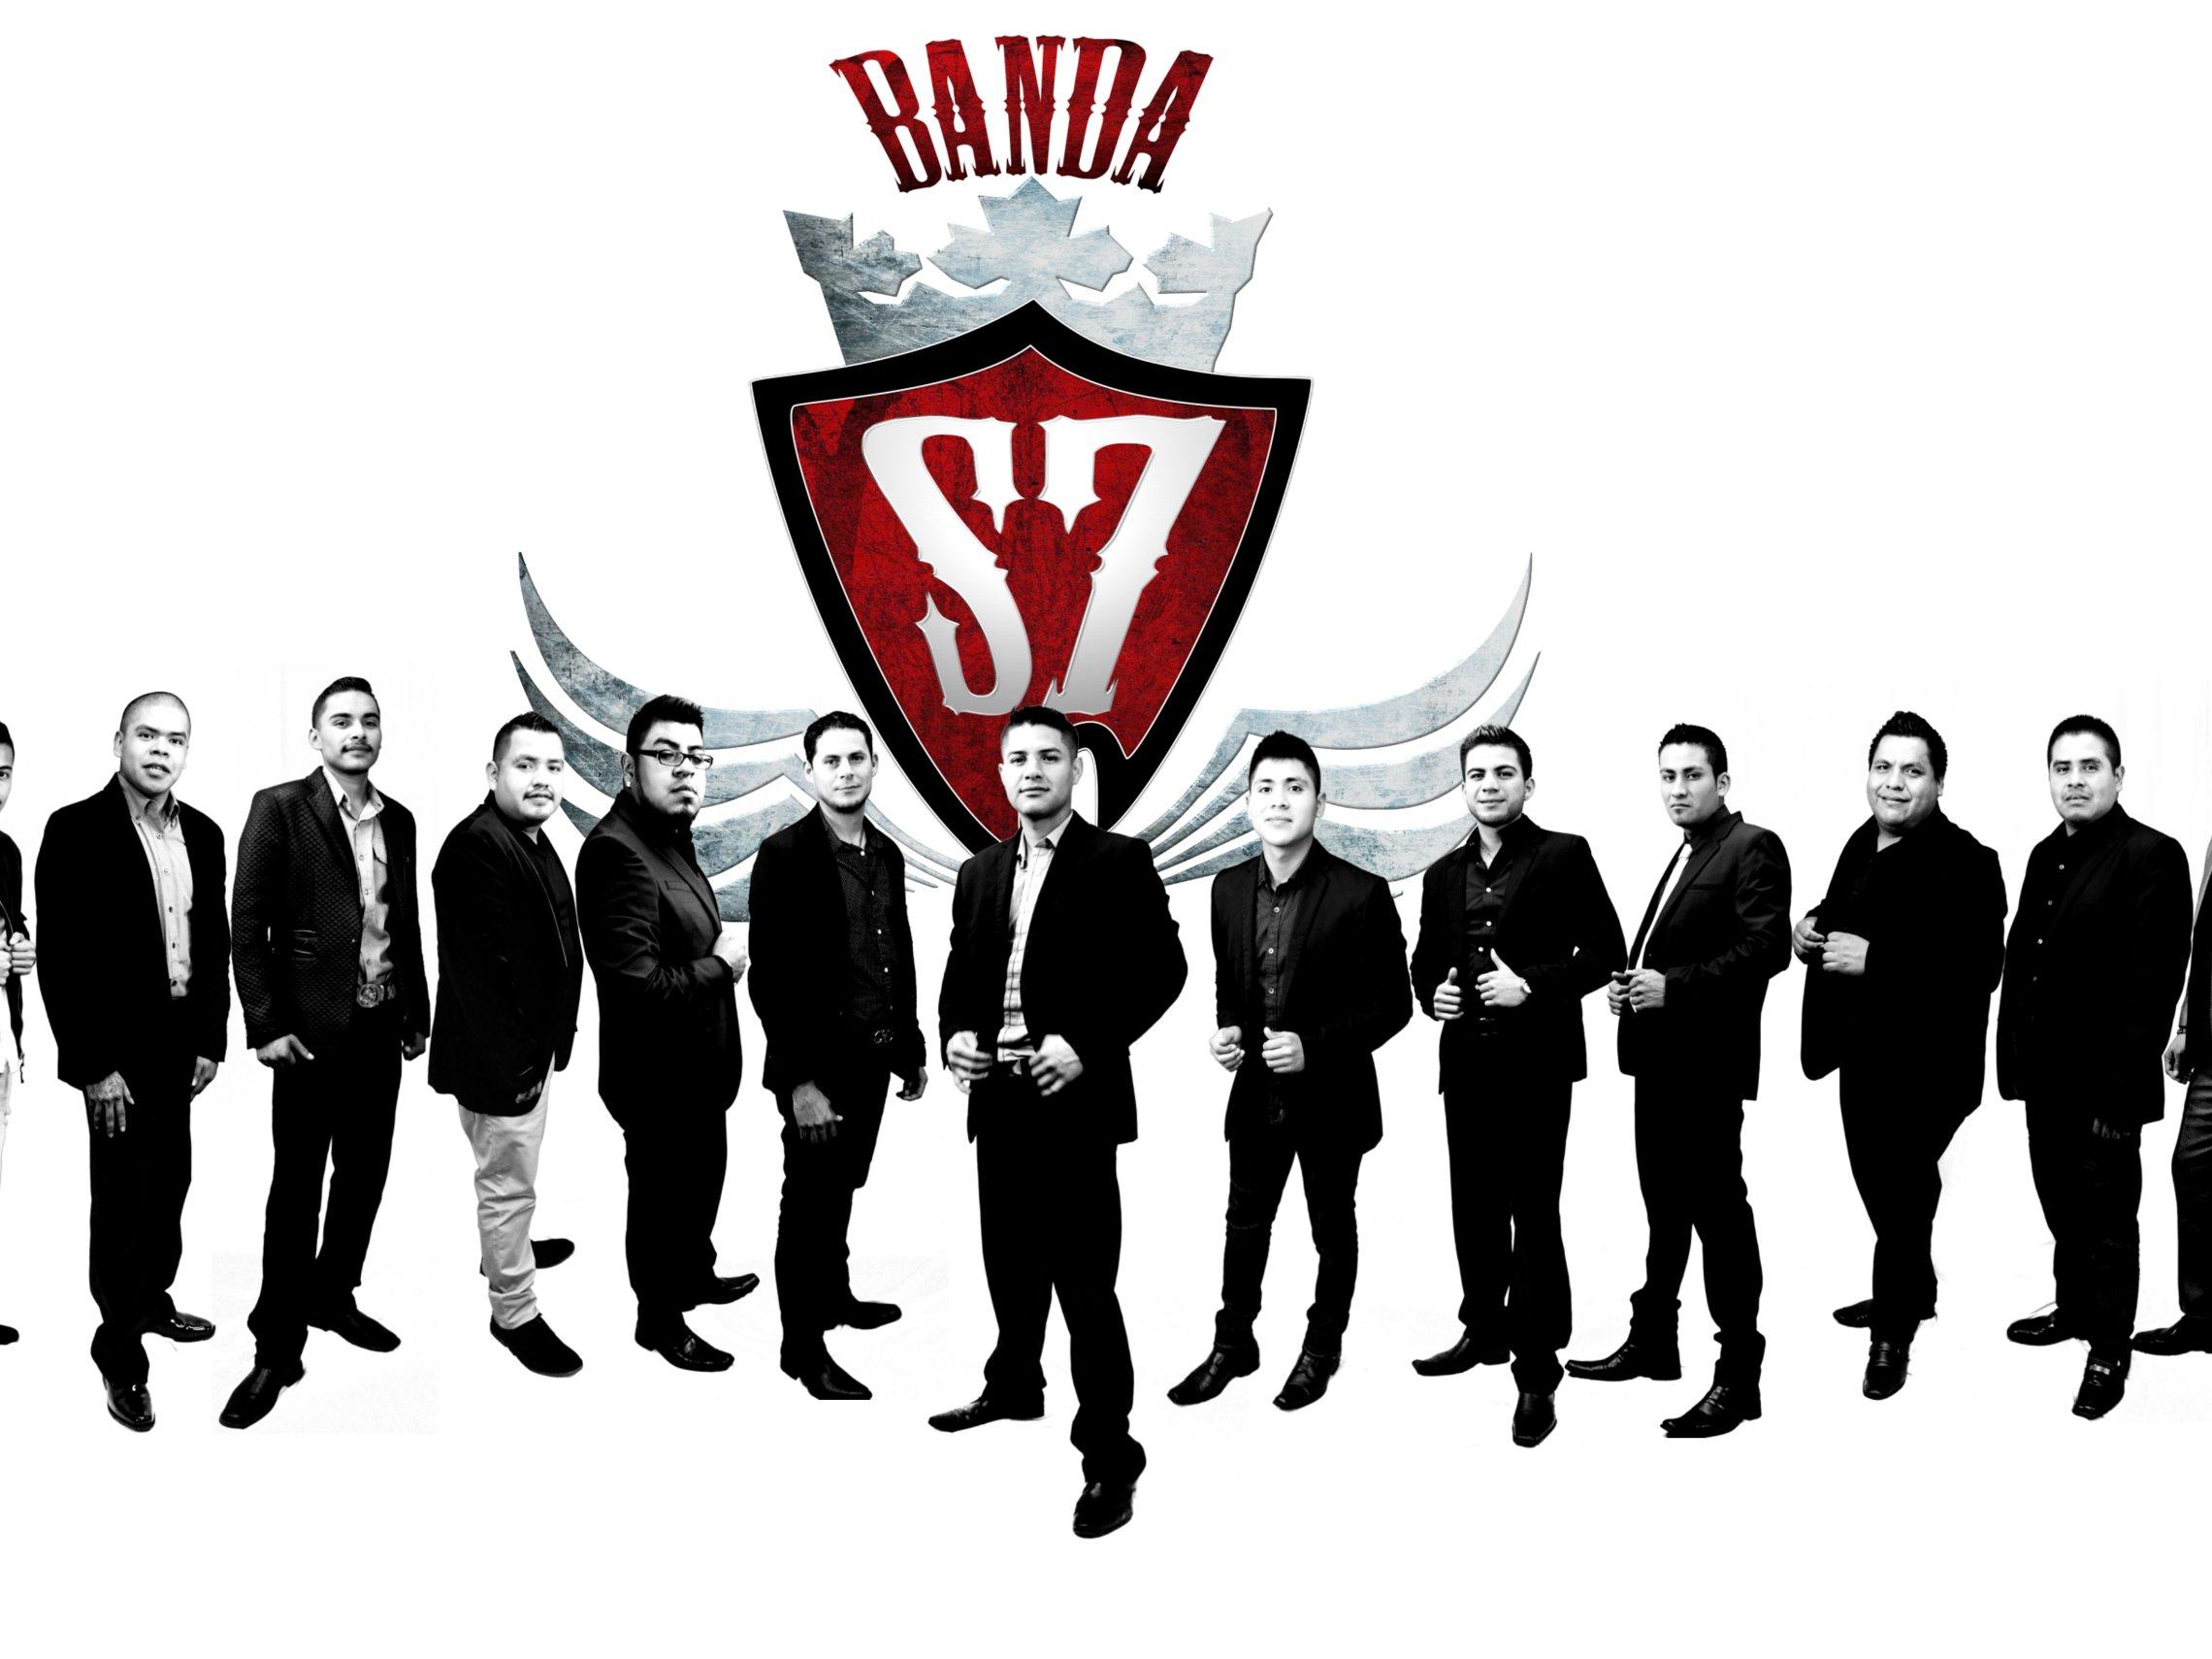 Image for Banda S7